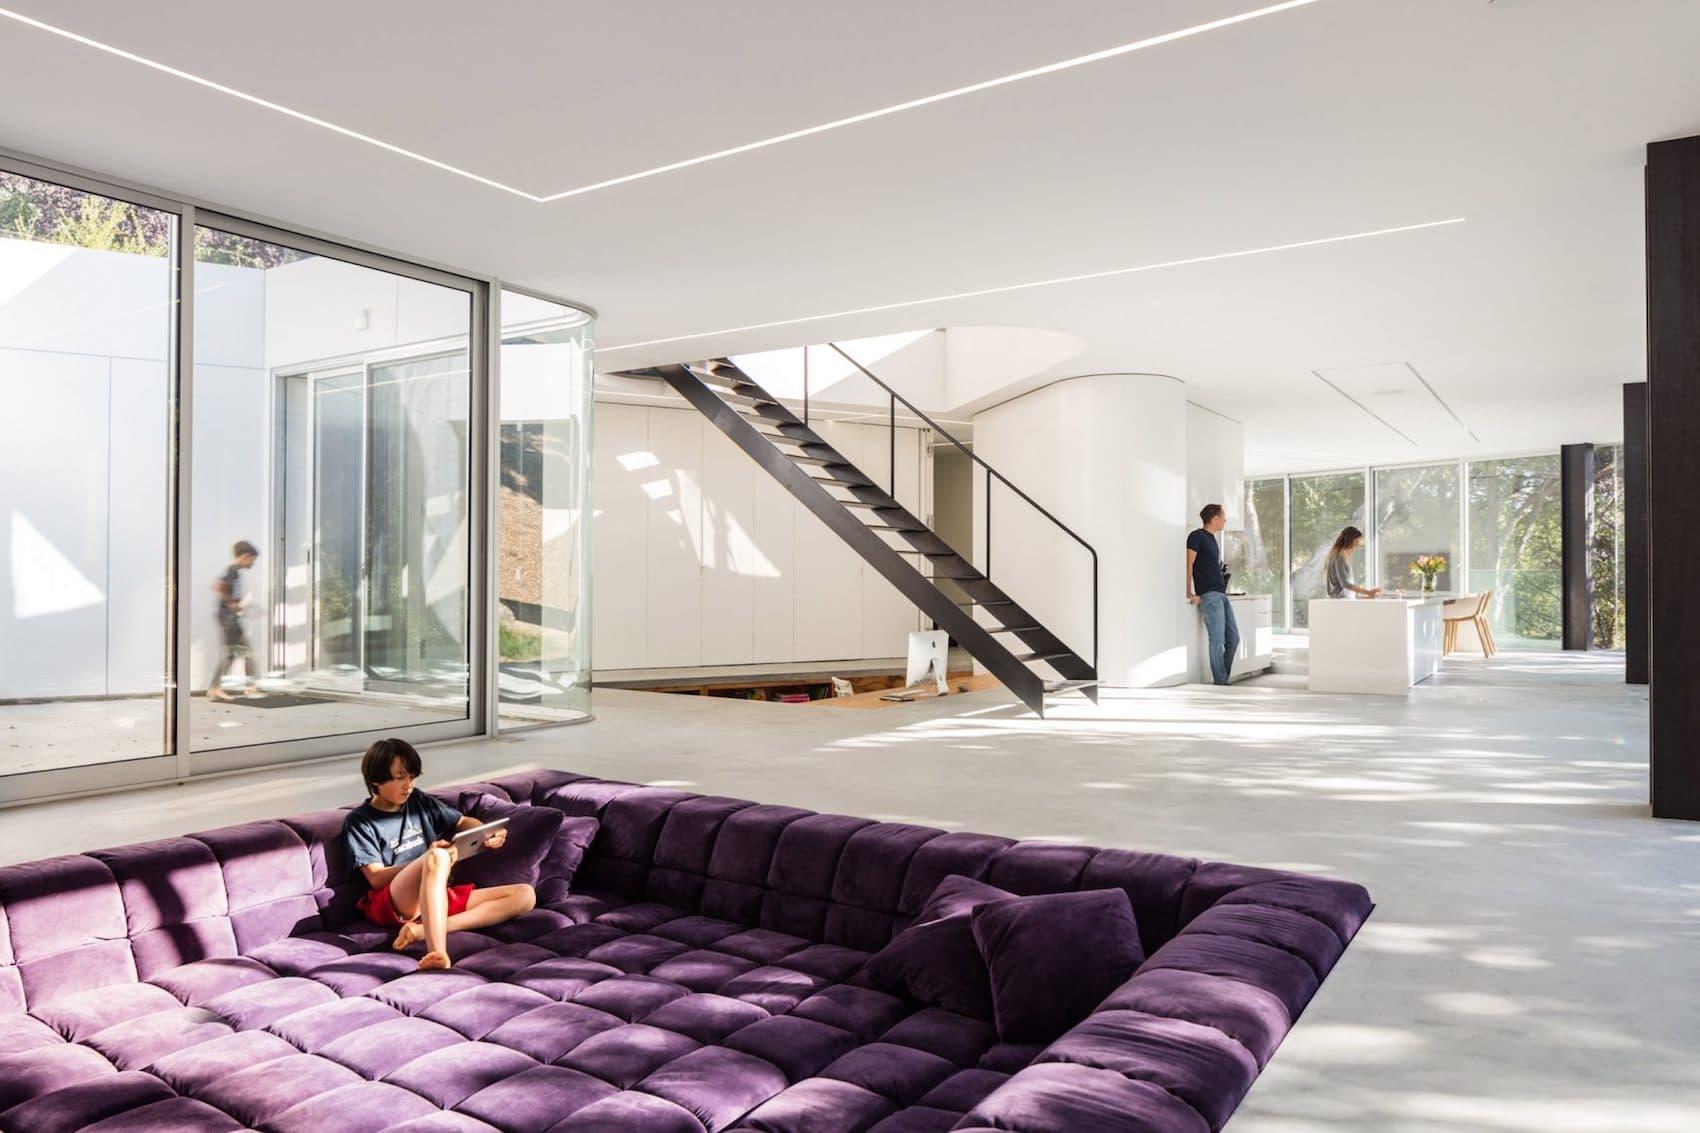 Licht ist Leben: Pam & Paul's House by Craig Steely Architecture 8